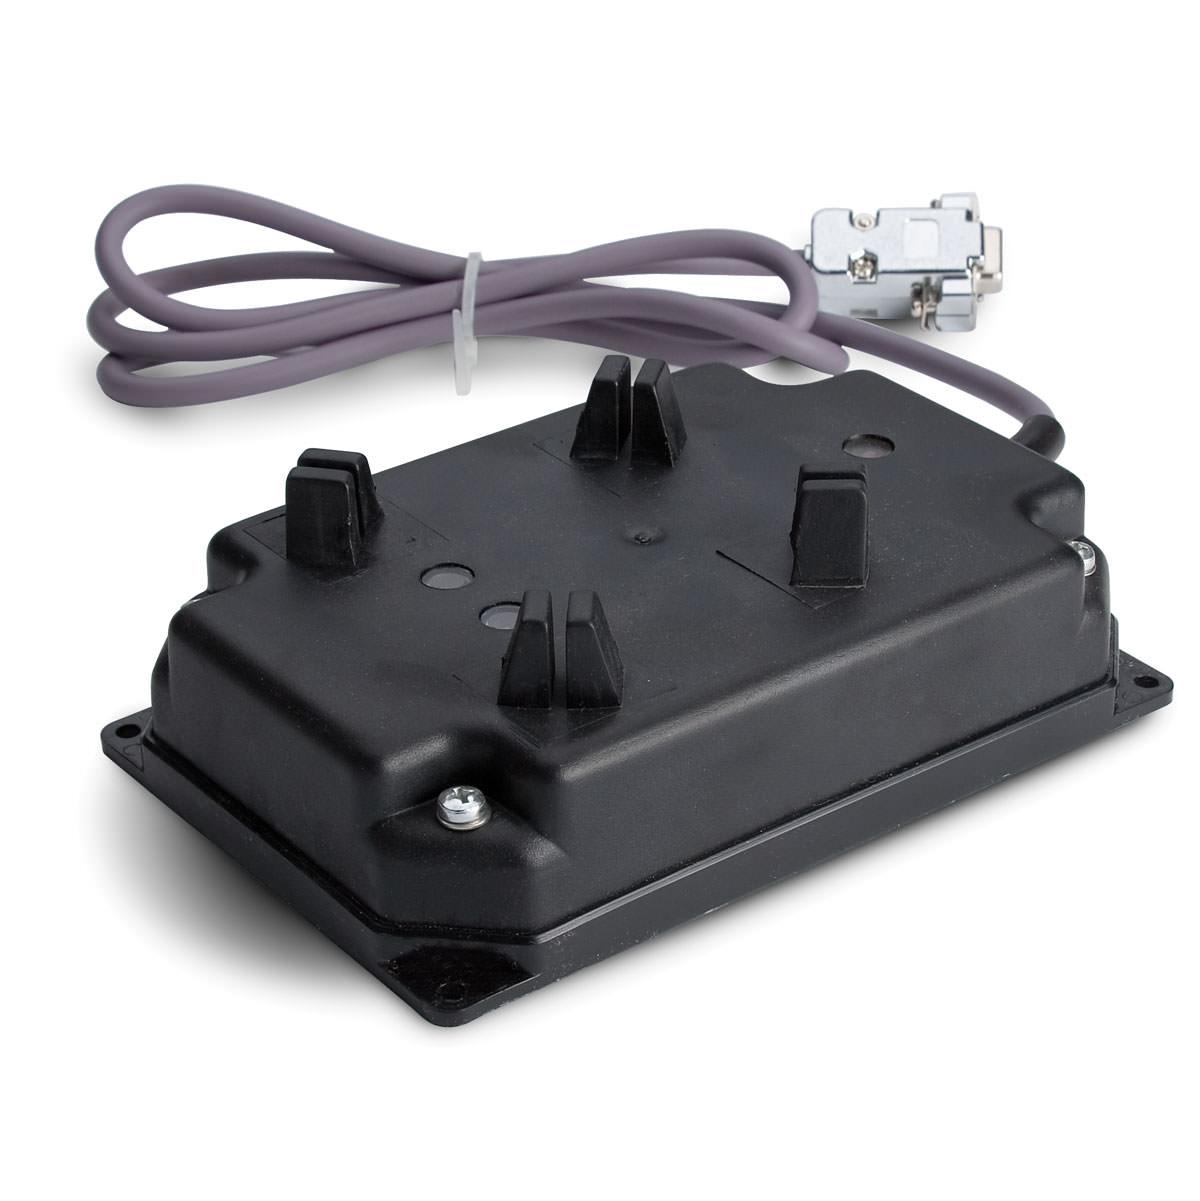 HI141001 Infrared Transmitter for Temperature Dataloggers